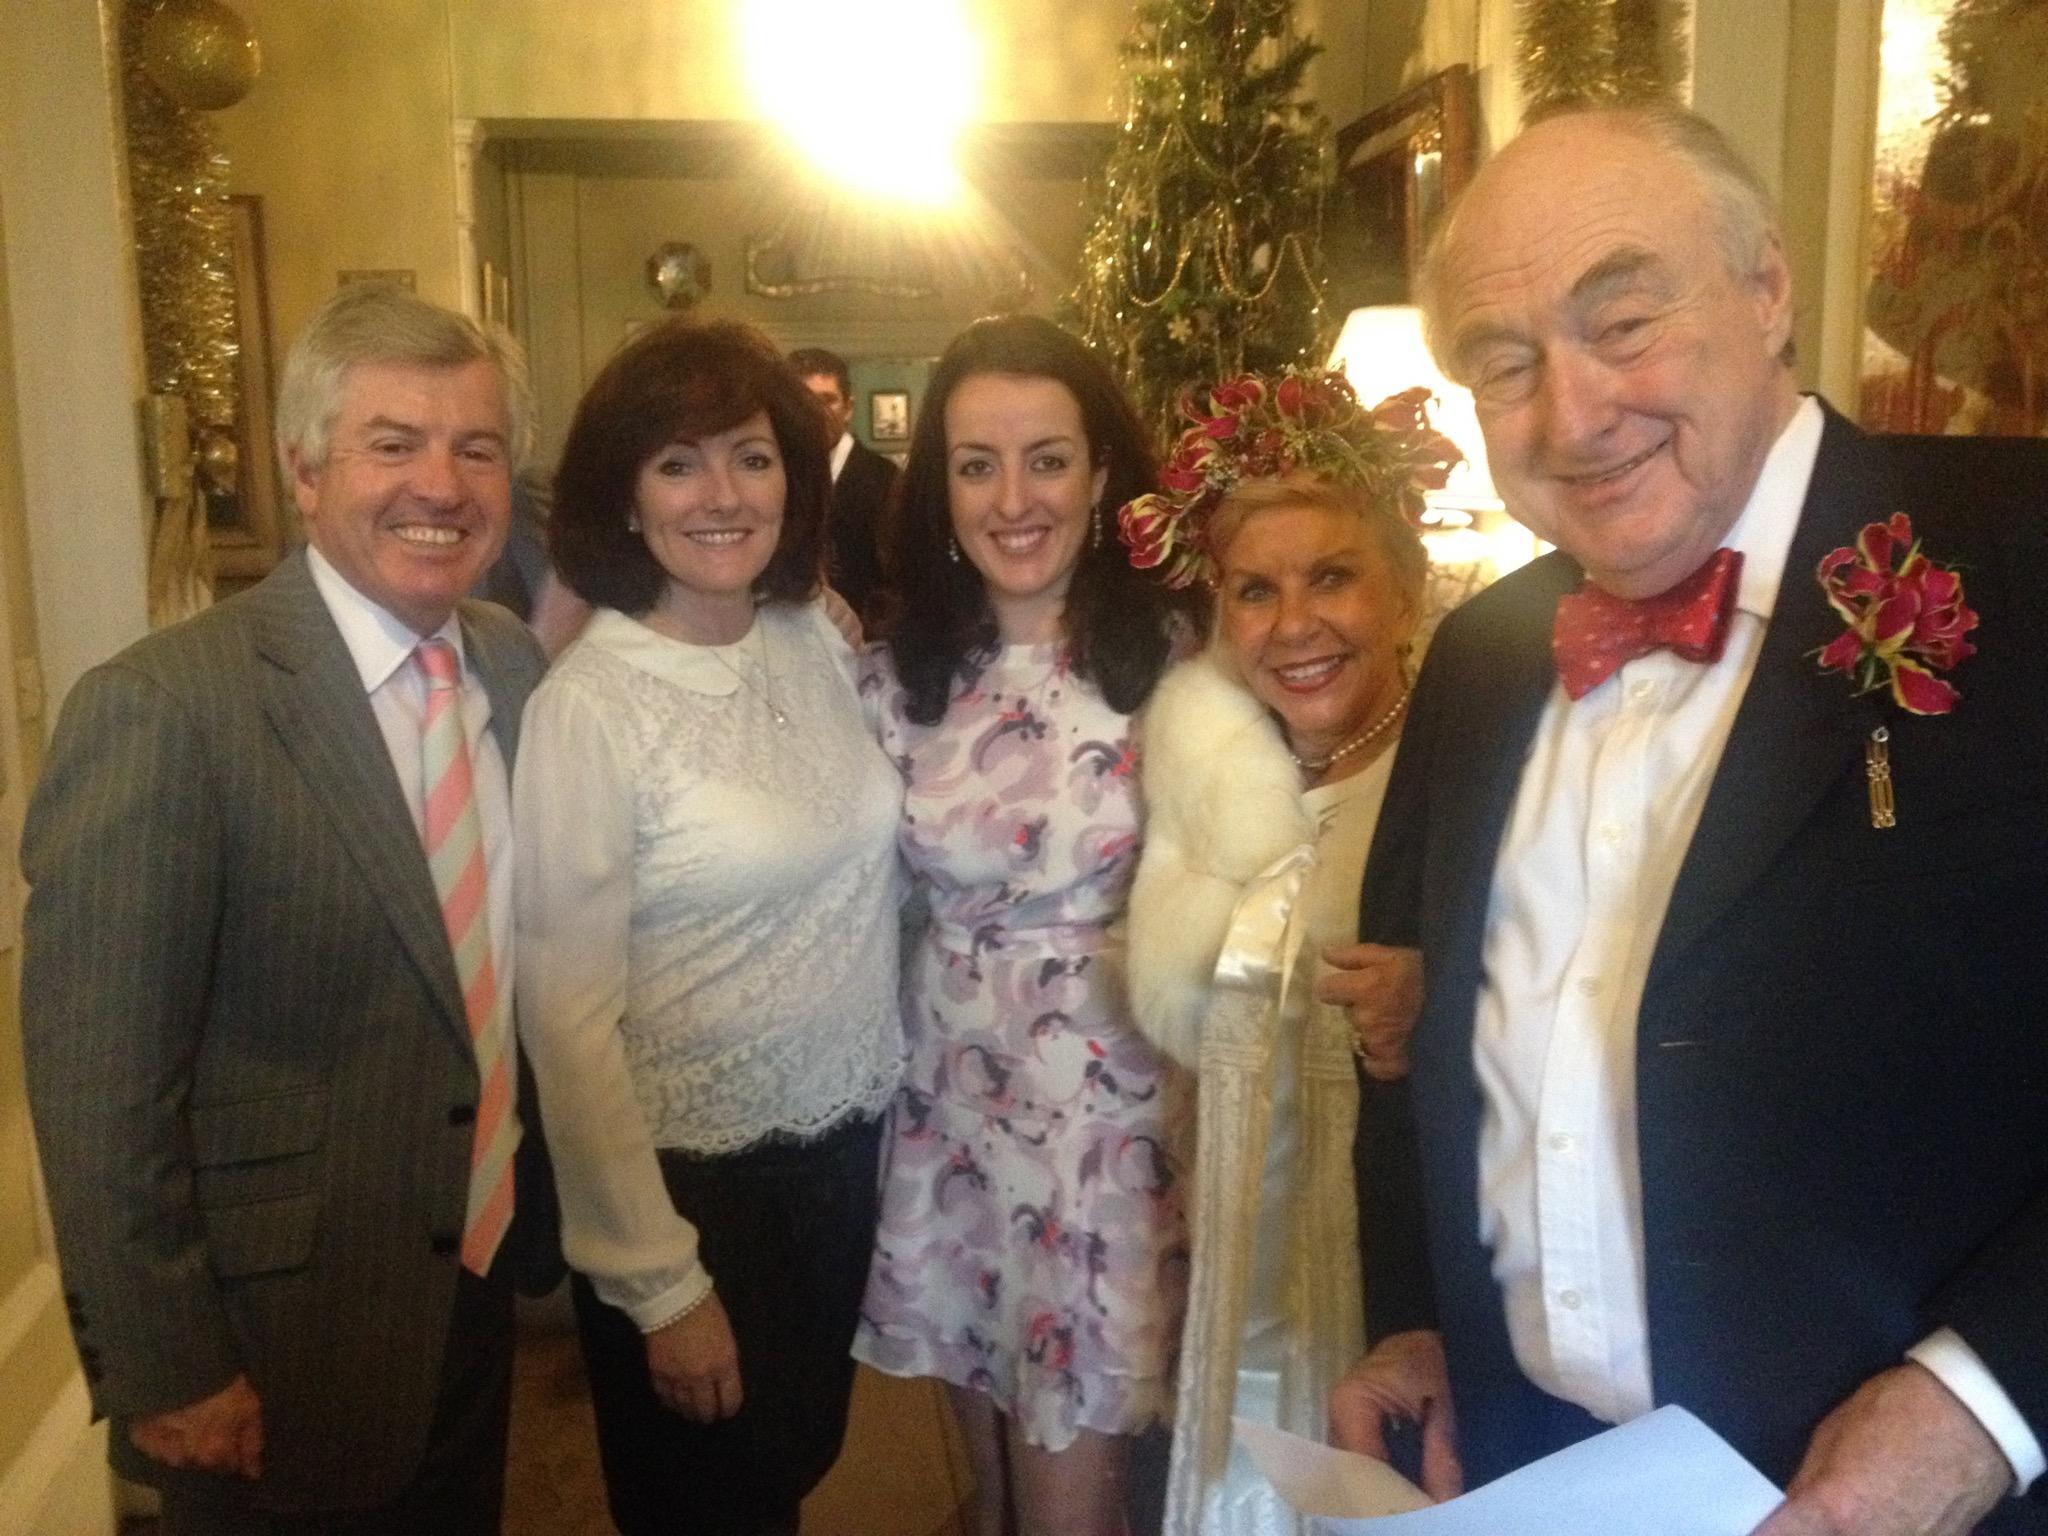 Dr Harry & Jacquie Brunjes at Henry and Valeria Blofeld's wedding with Emma Brunjes